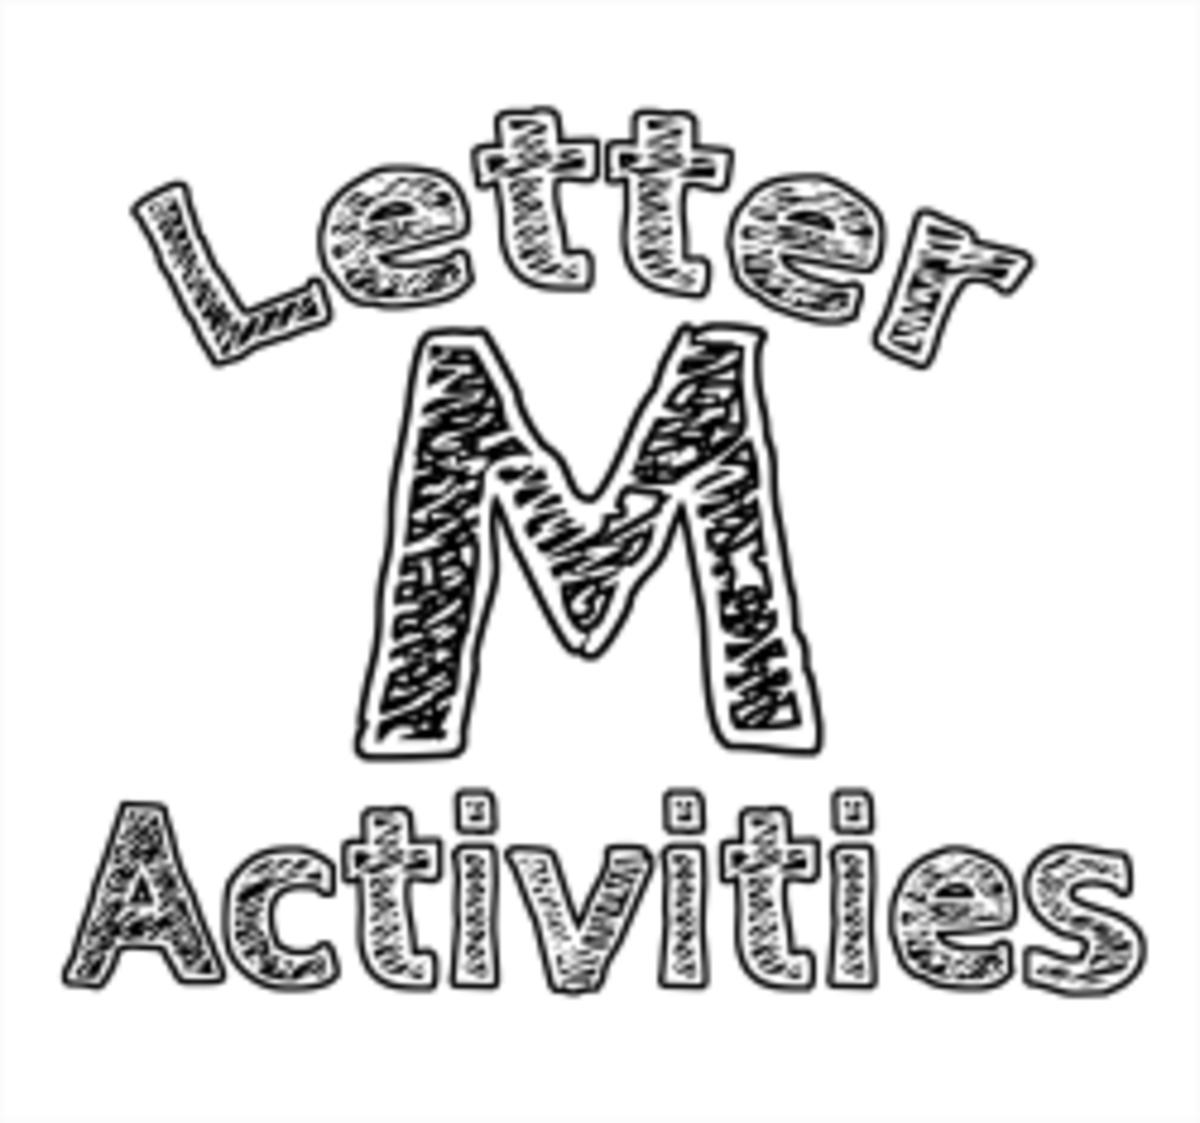 letter-m-alphabet-activities-for-kids